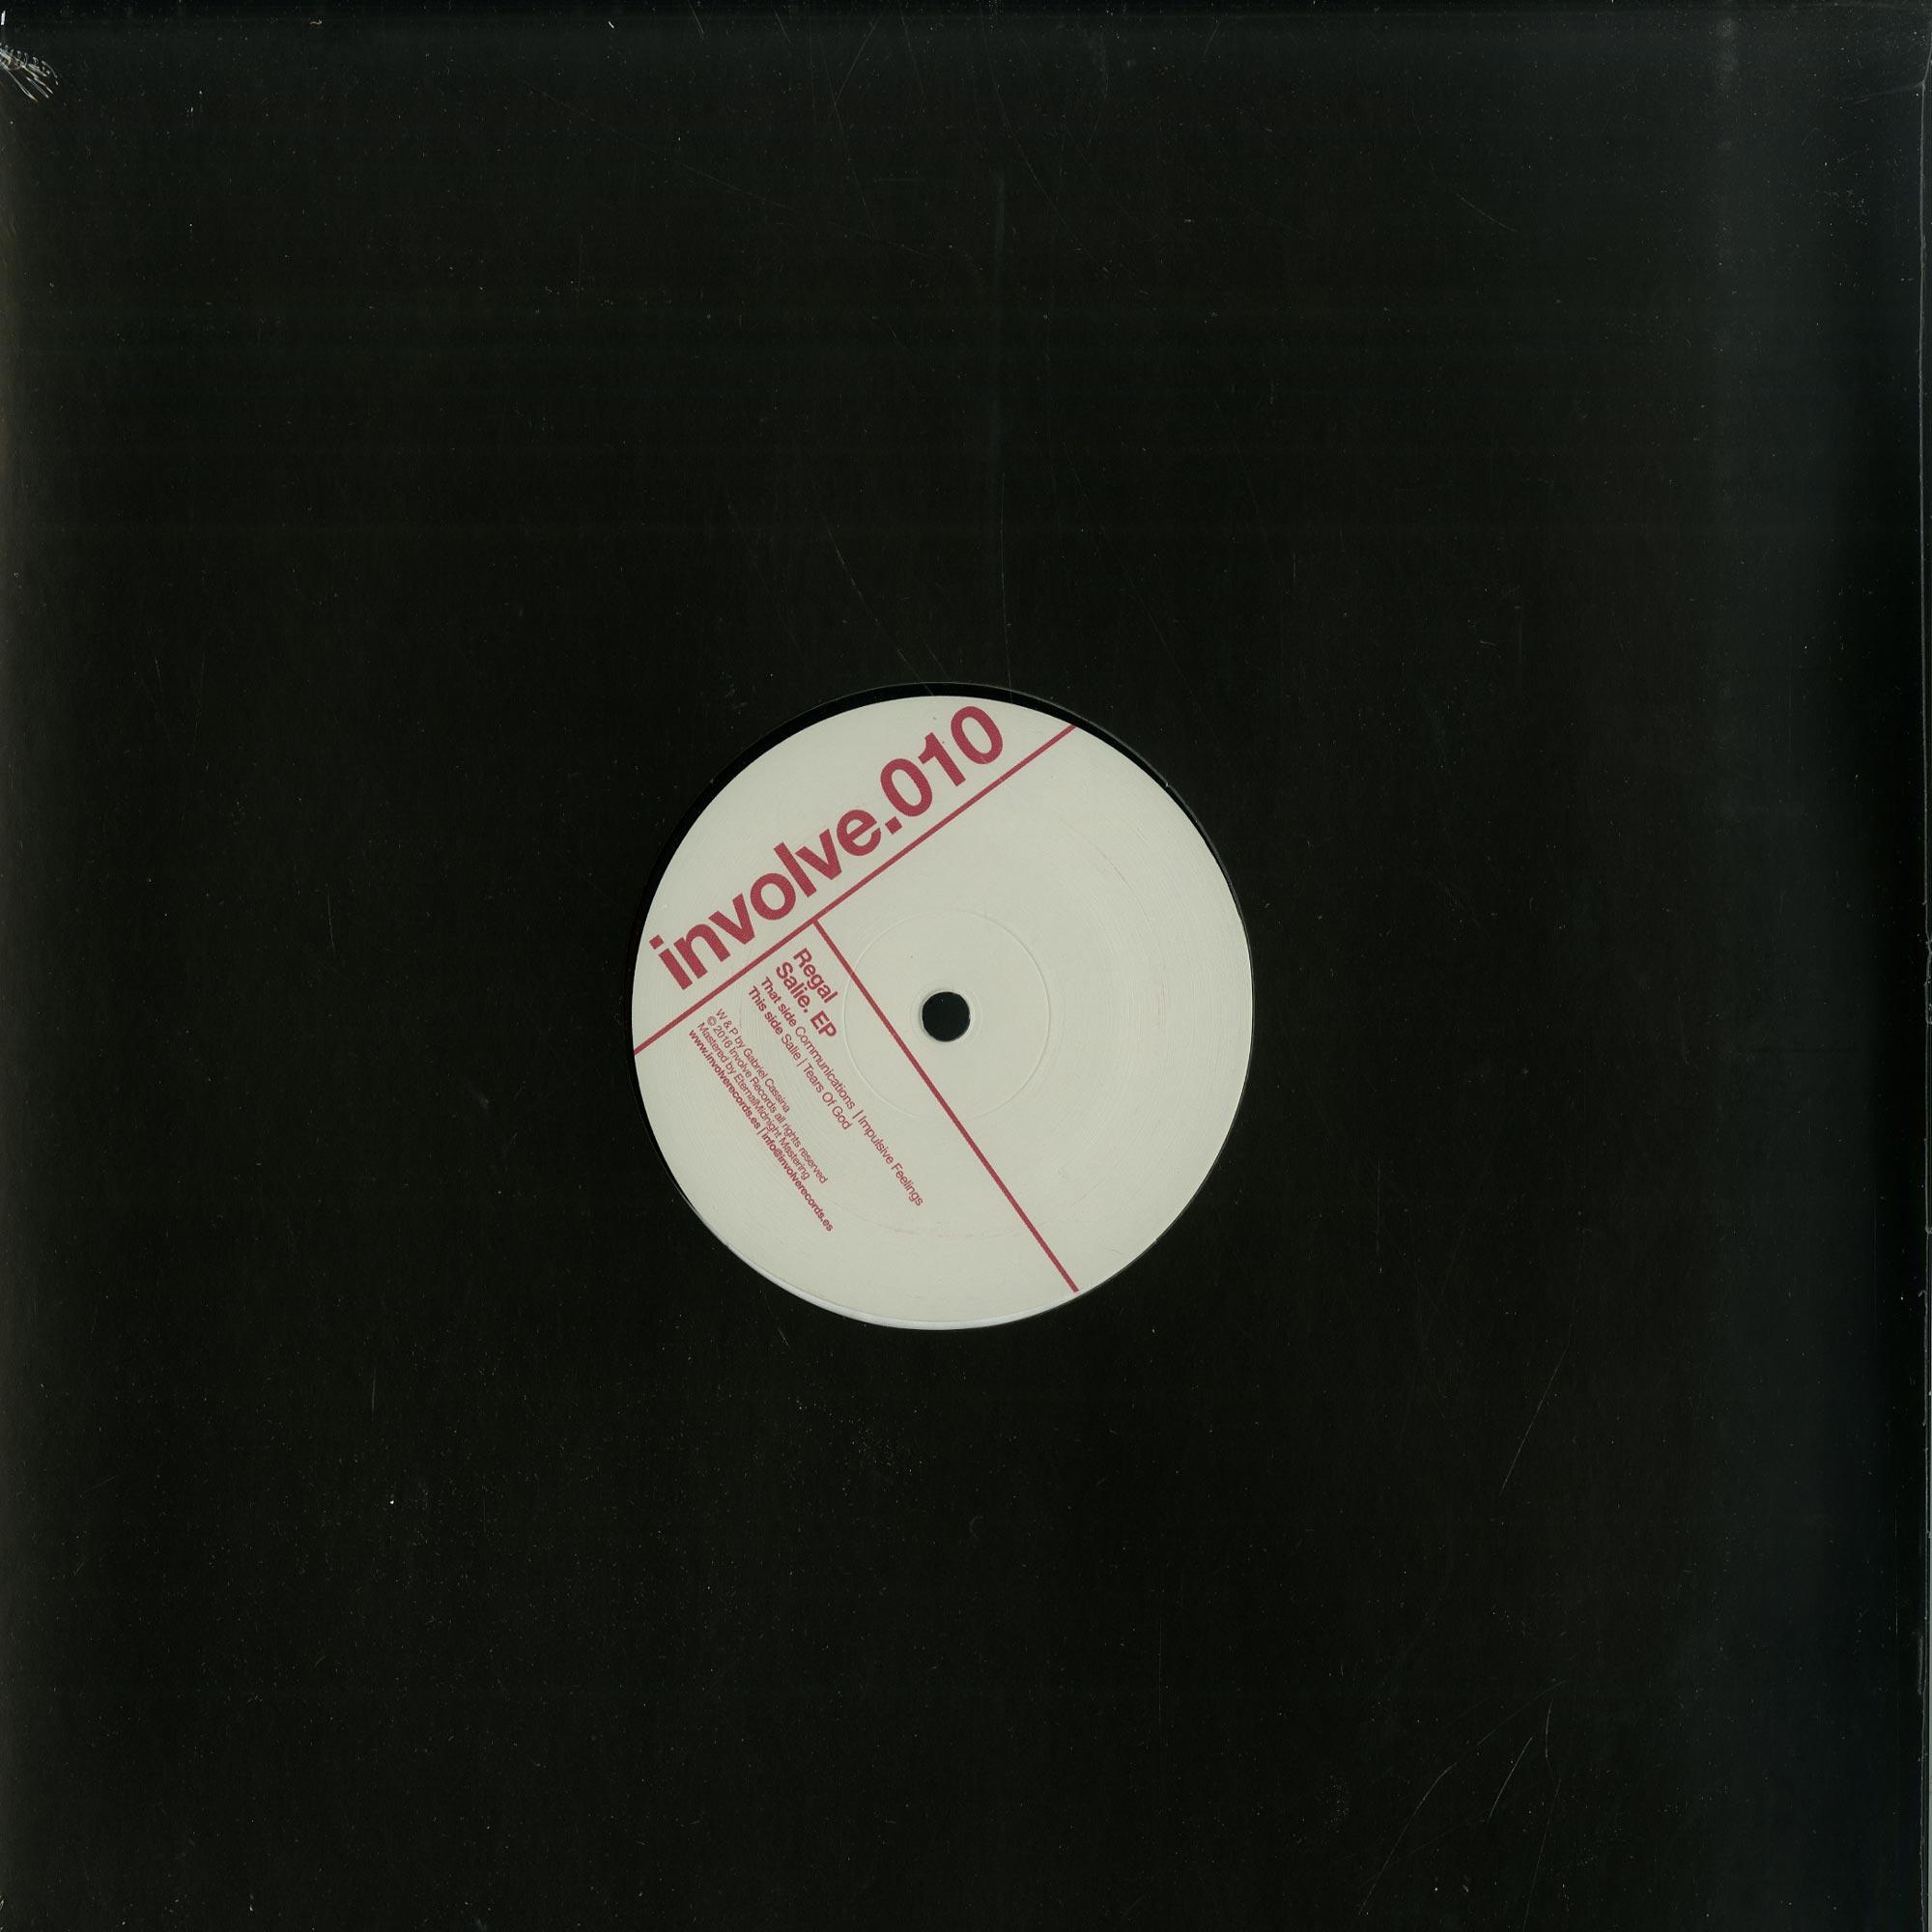 Regal - SALIE EP